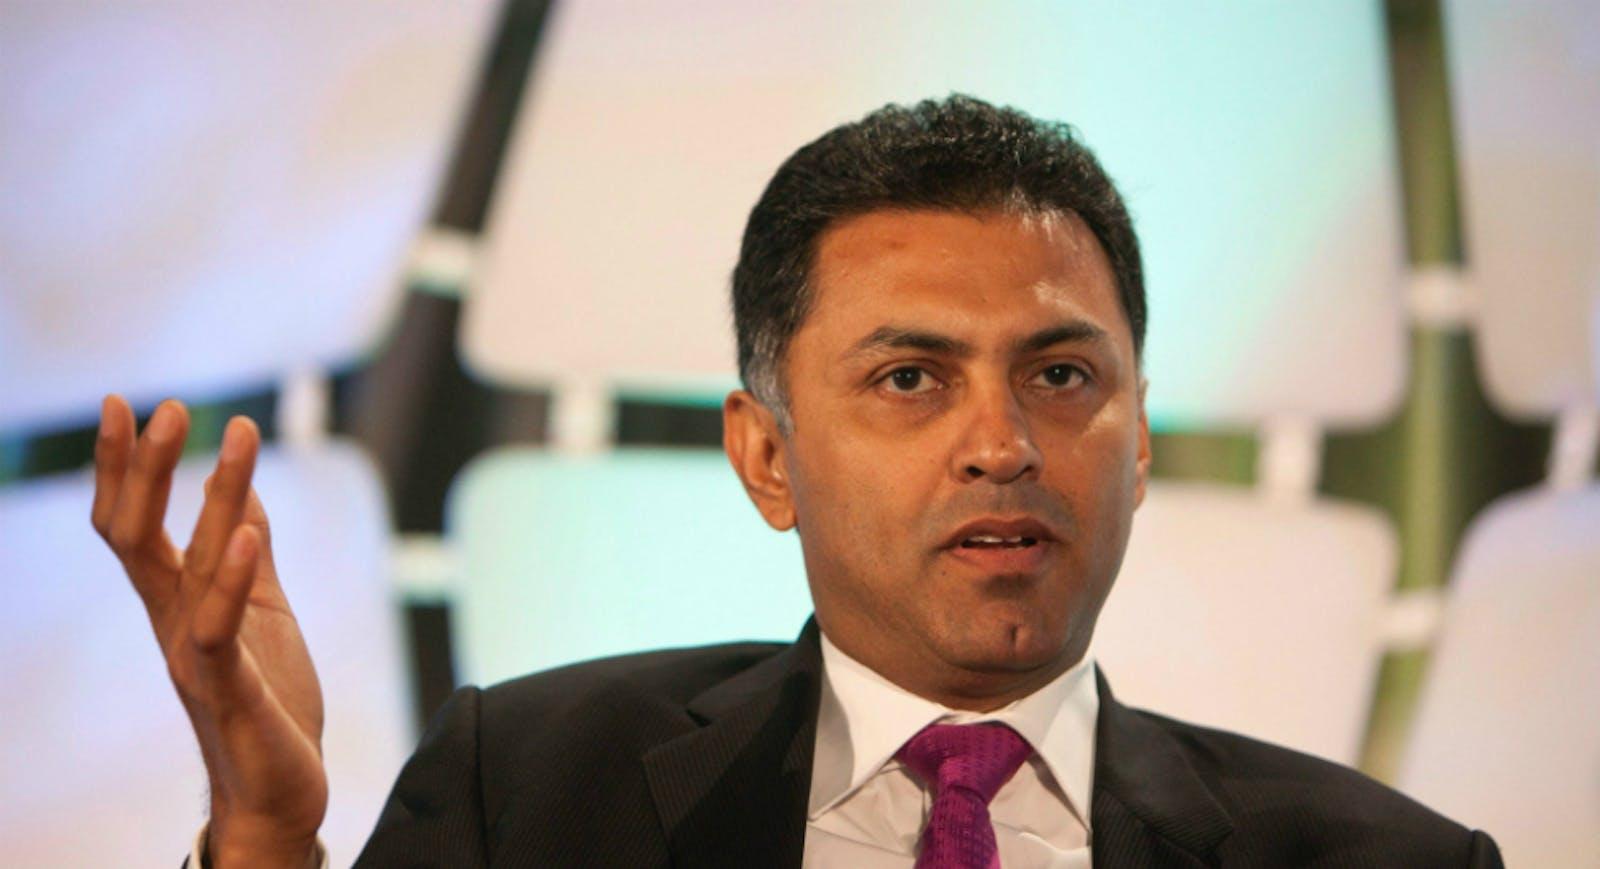 Former Google executive Nikesh Arora. Photo by Bloomberg.